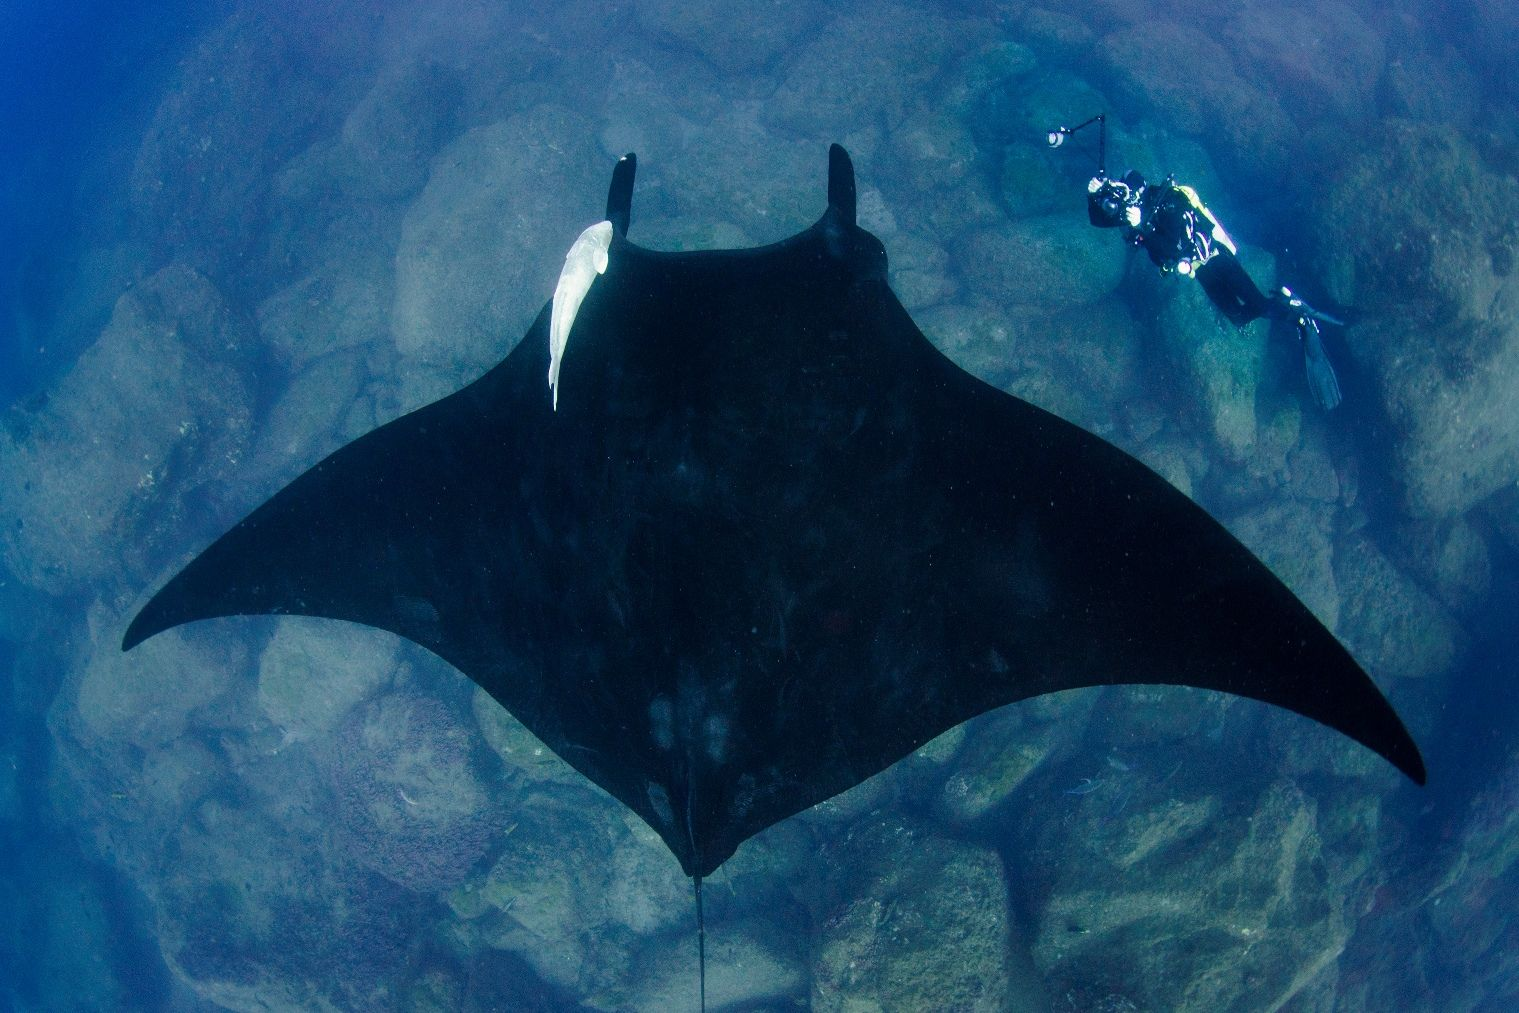 Giant manta rays   Amazing genetics - diversity of life   Pinterest   Manta  ray, Humpback whale and Shark